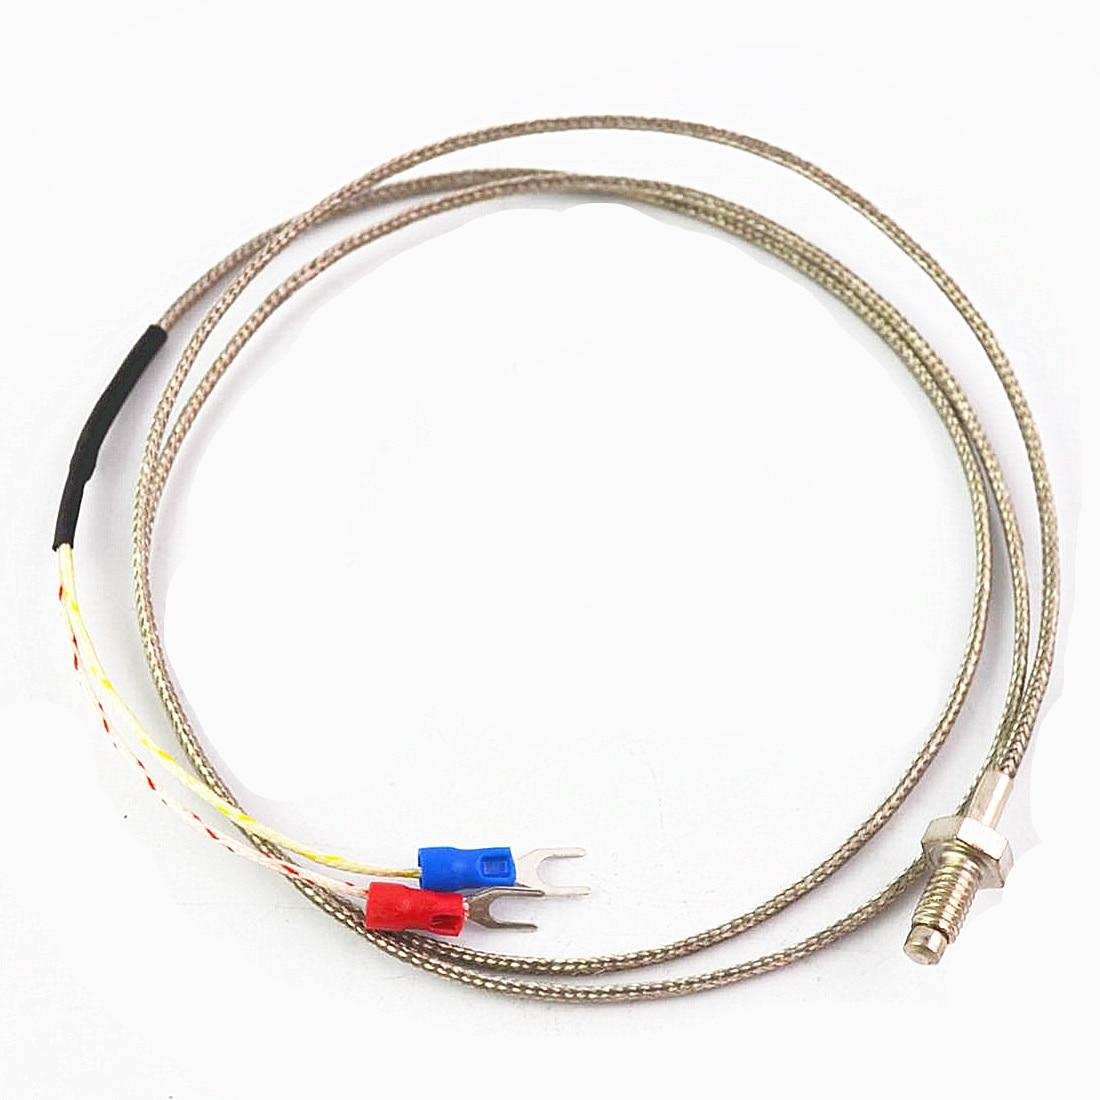 M6 Thread K Type Thermocouple Temperature Controller 0-800C Sensor Cable Wire 1M 2M 3M